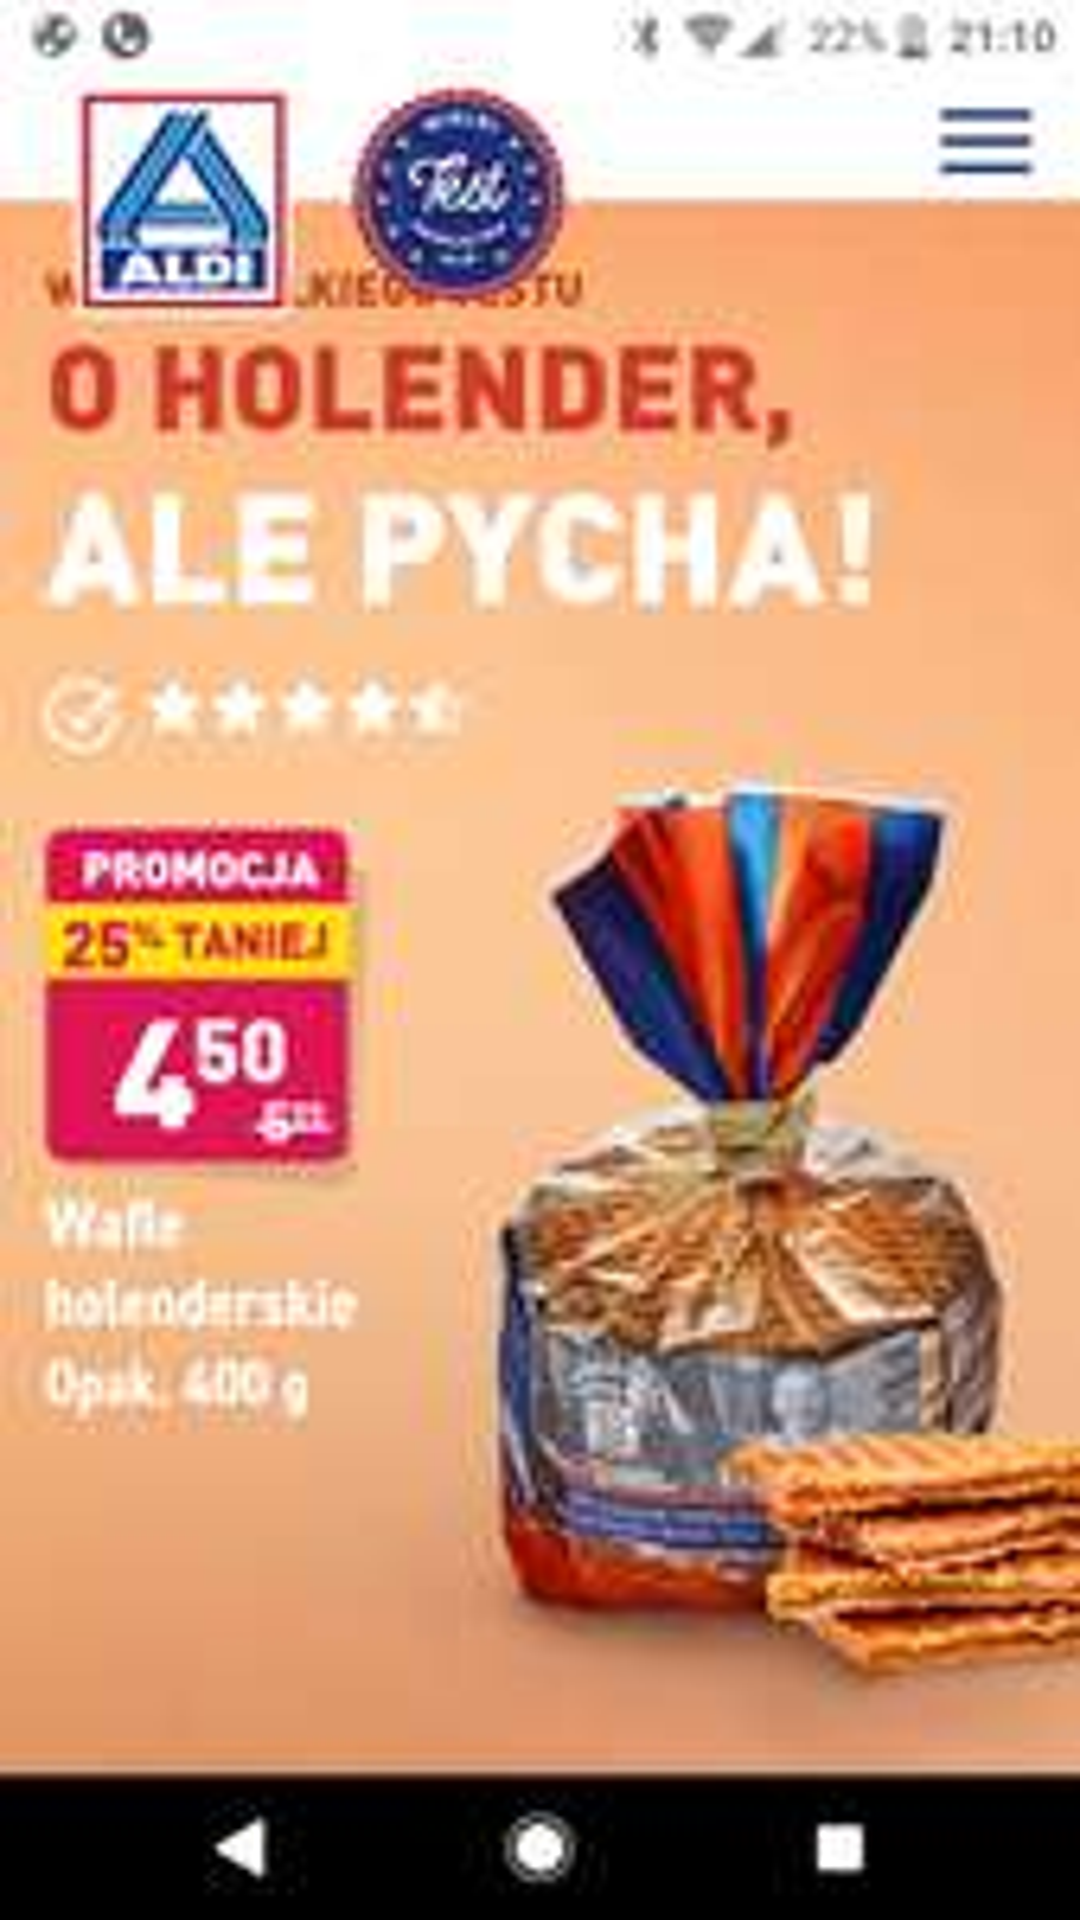 Aldi Wafle holenderskie - 25%